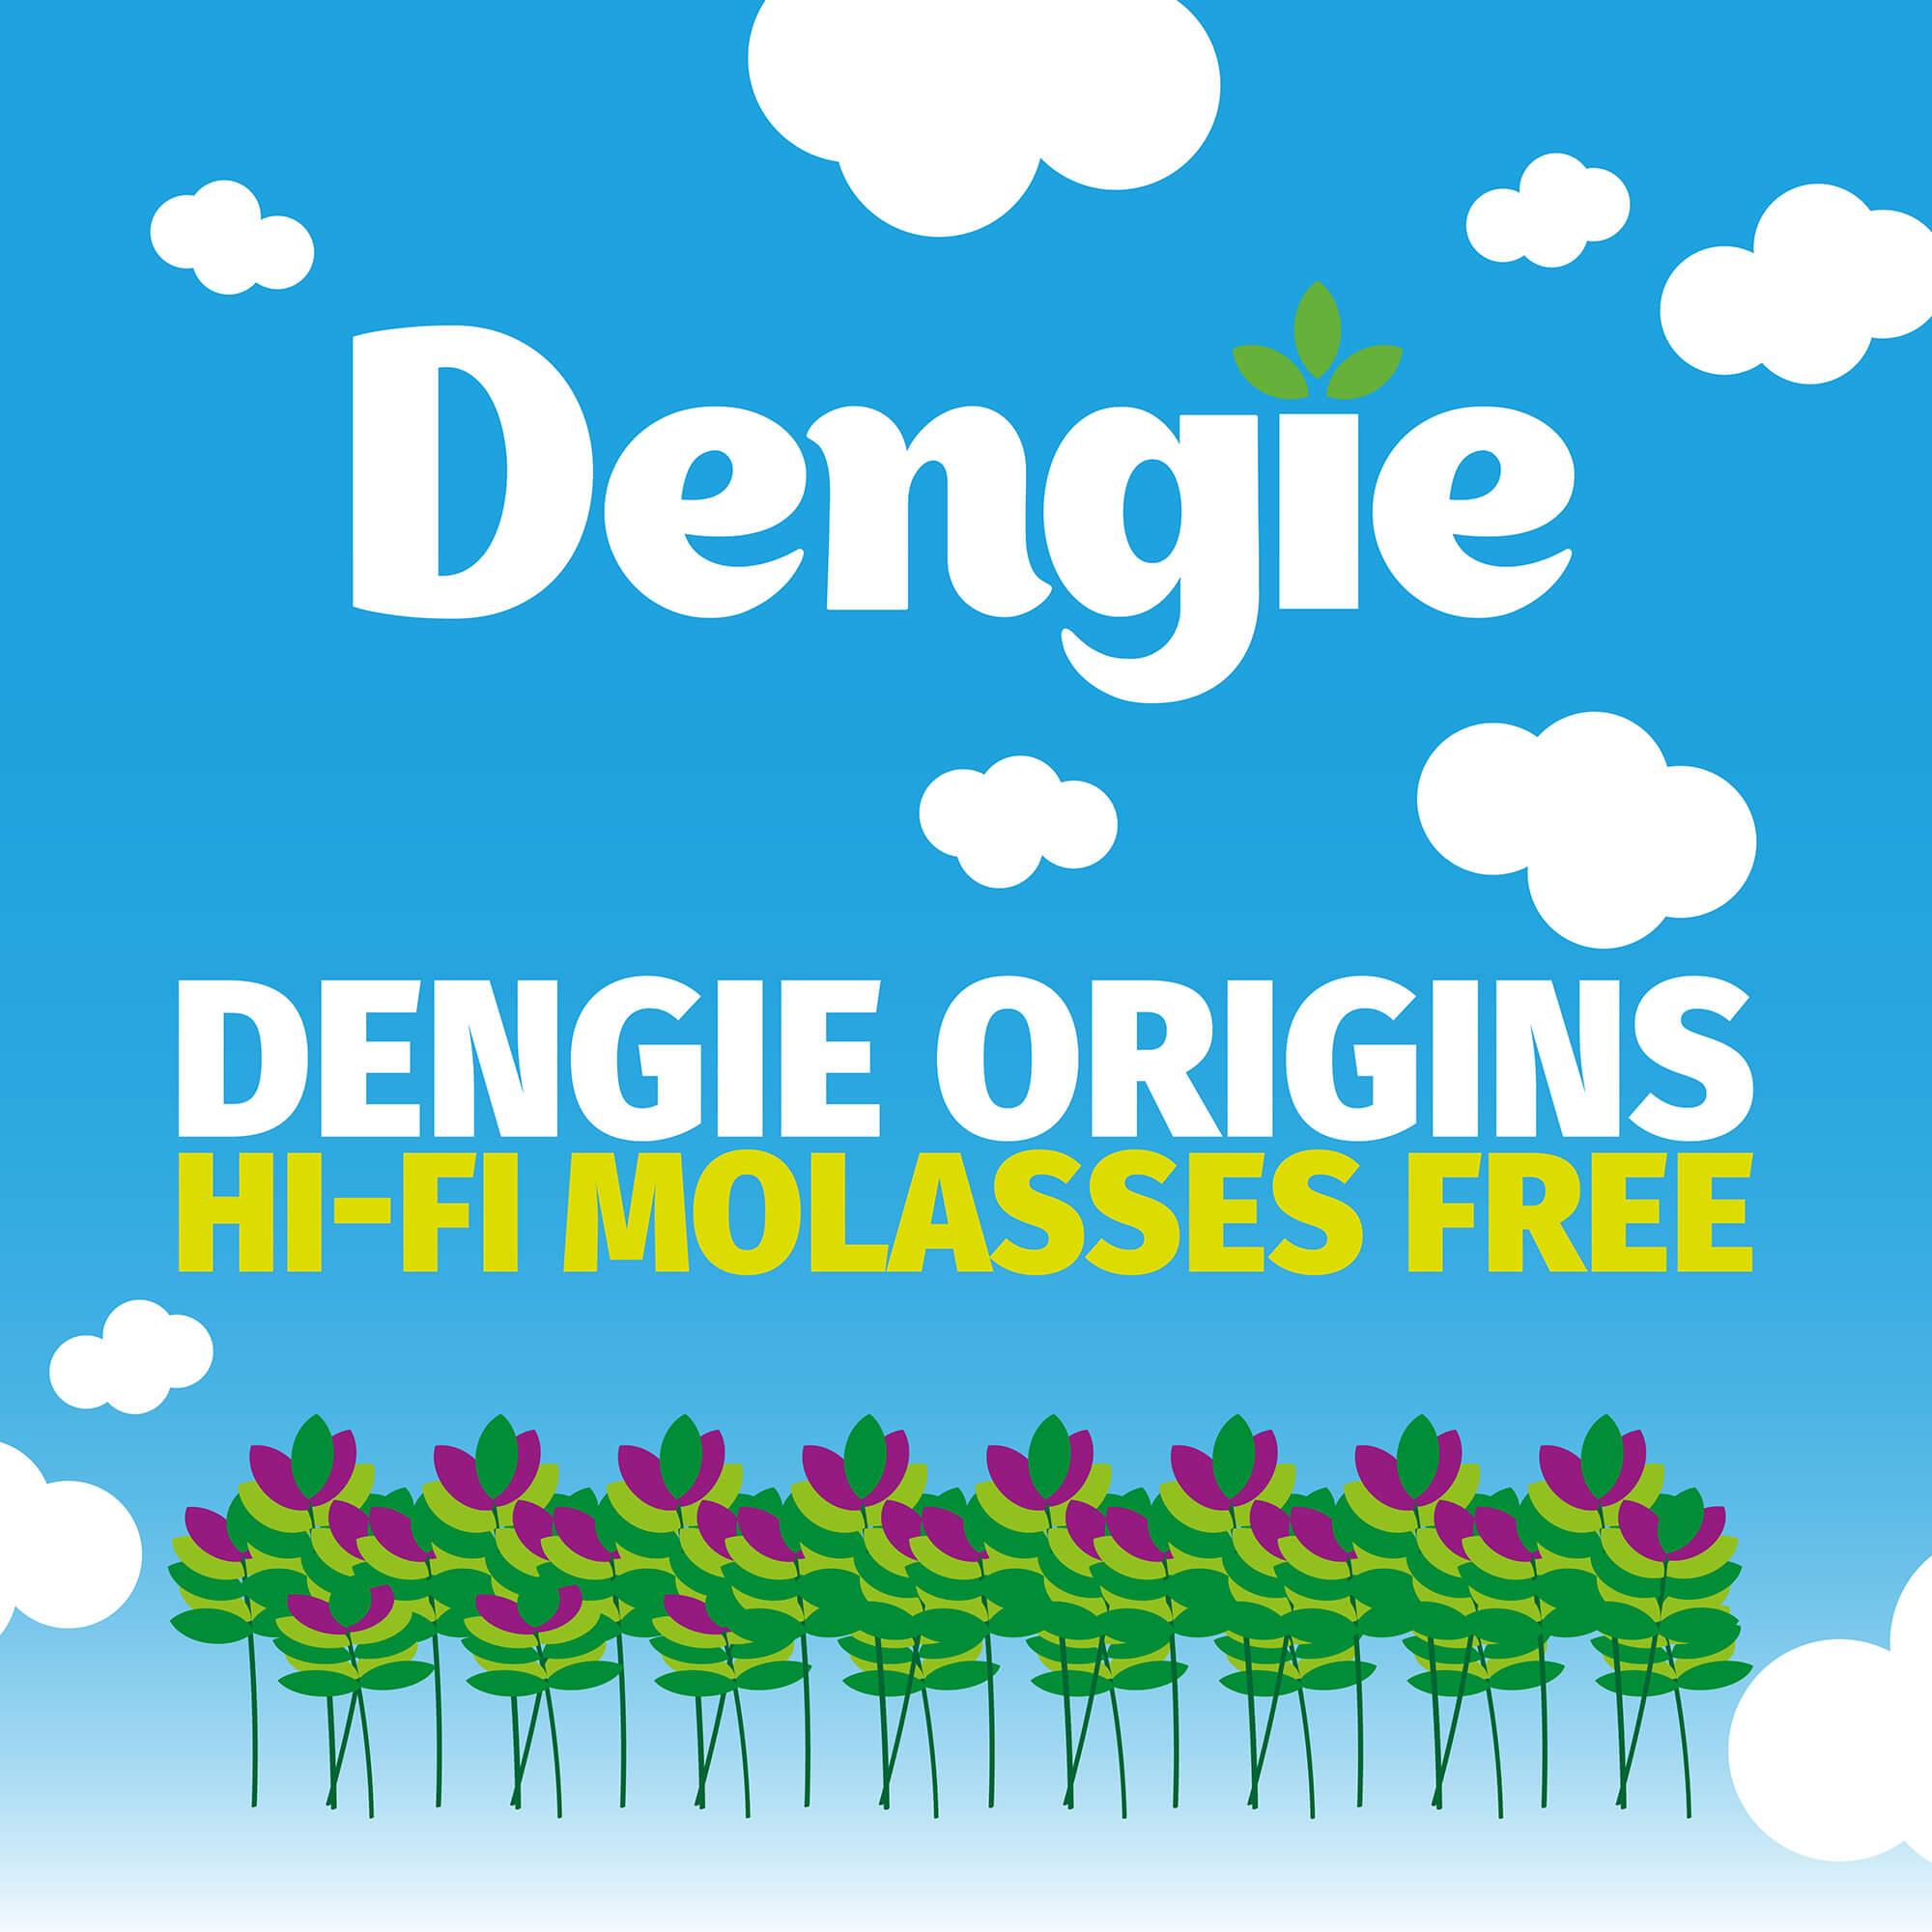 Dengie Hi-Fi